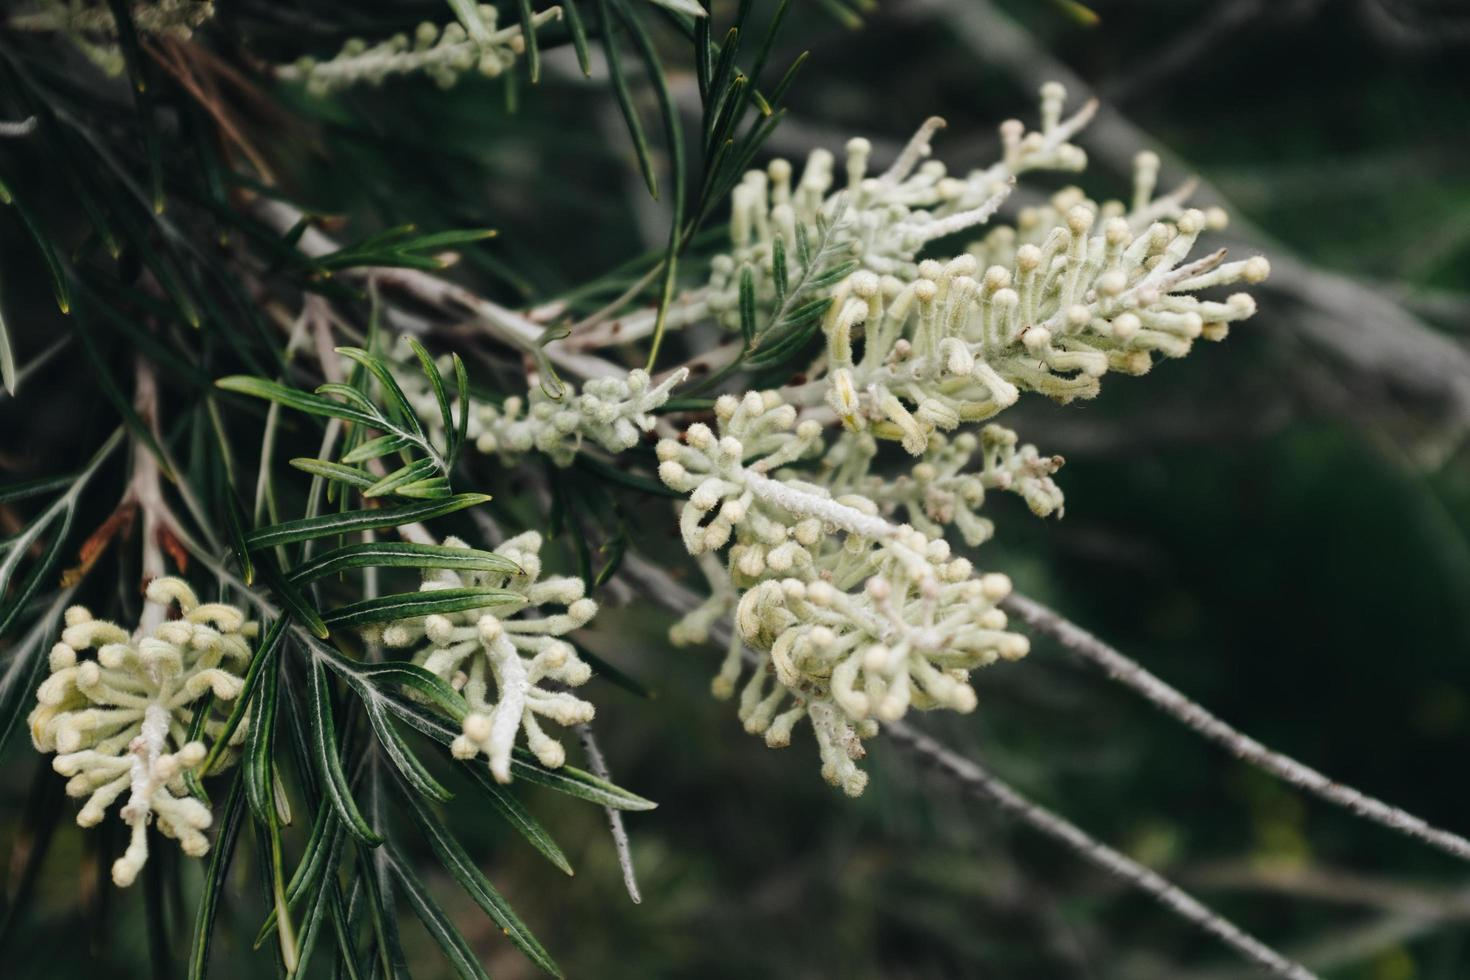 vitbladad blomma foto